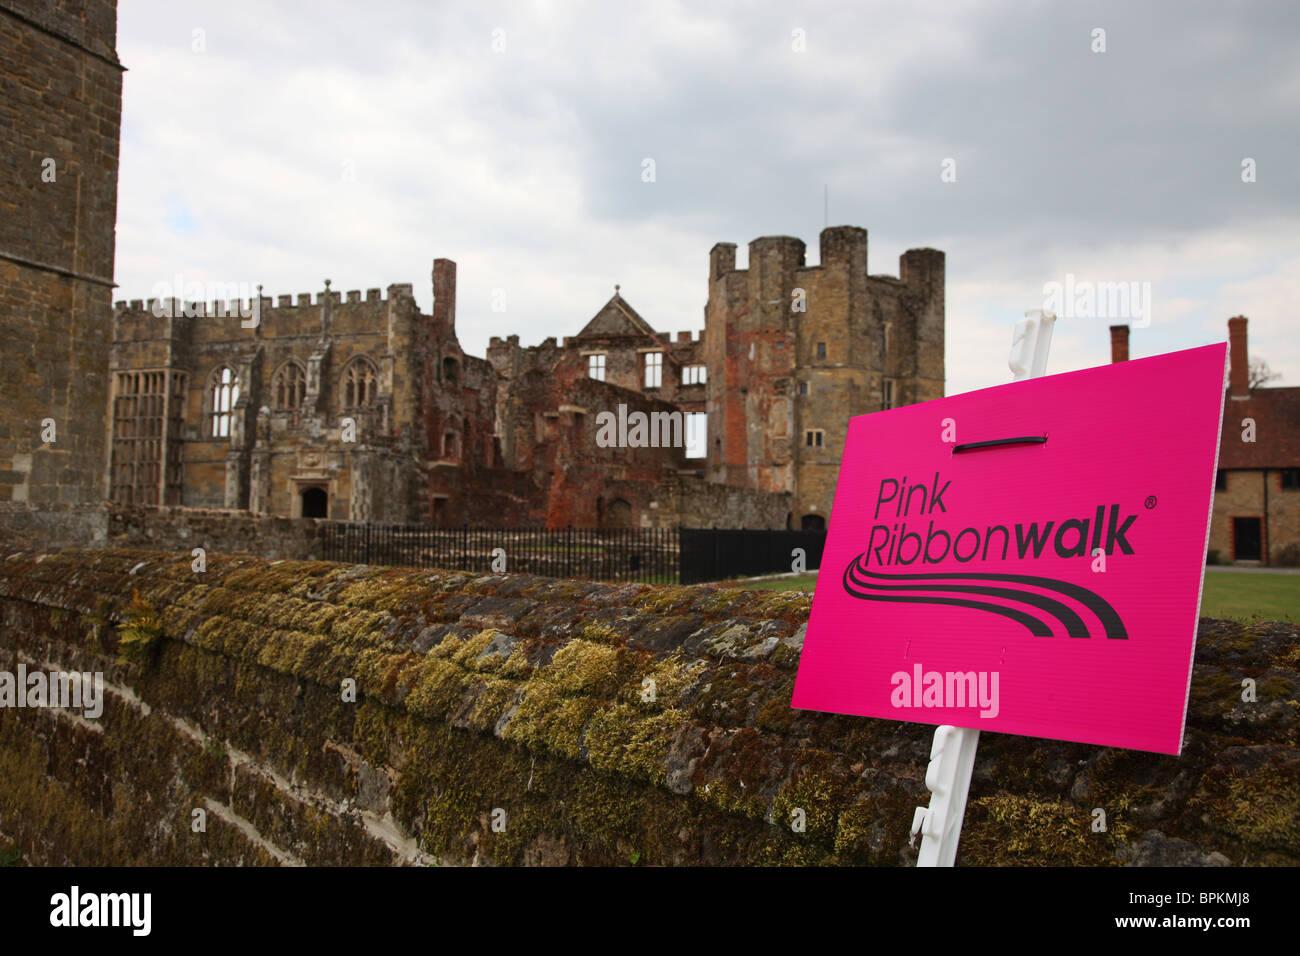 'pink ribbon walk' cowdray castle - Stock Image